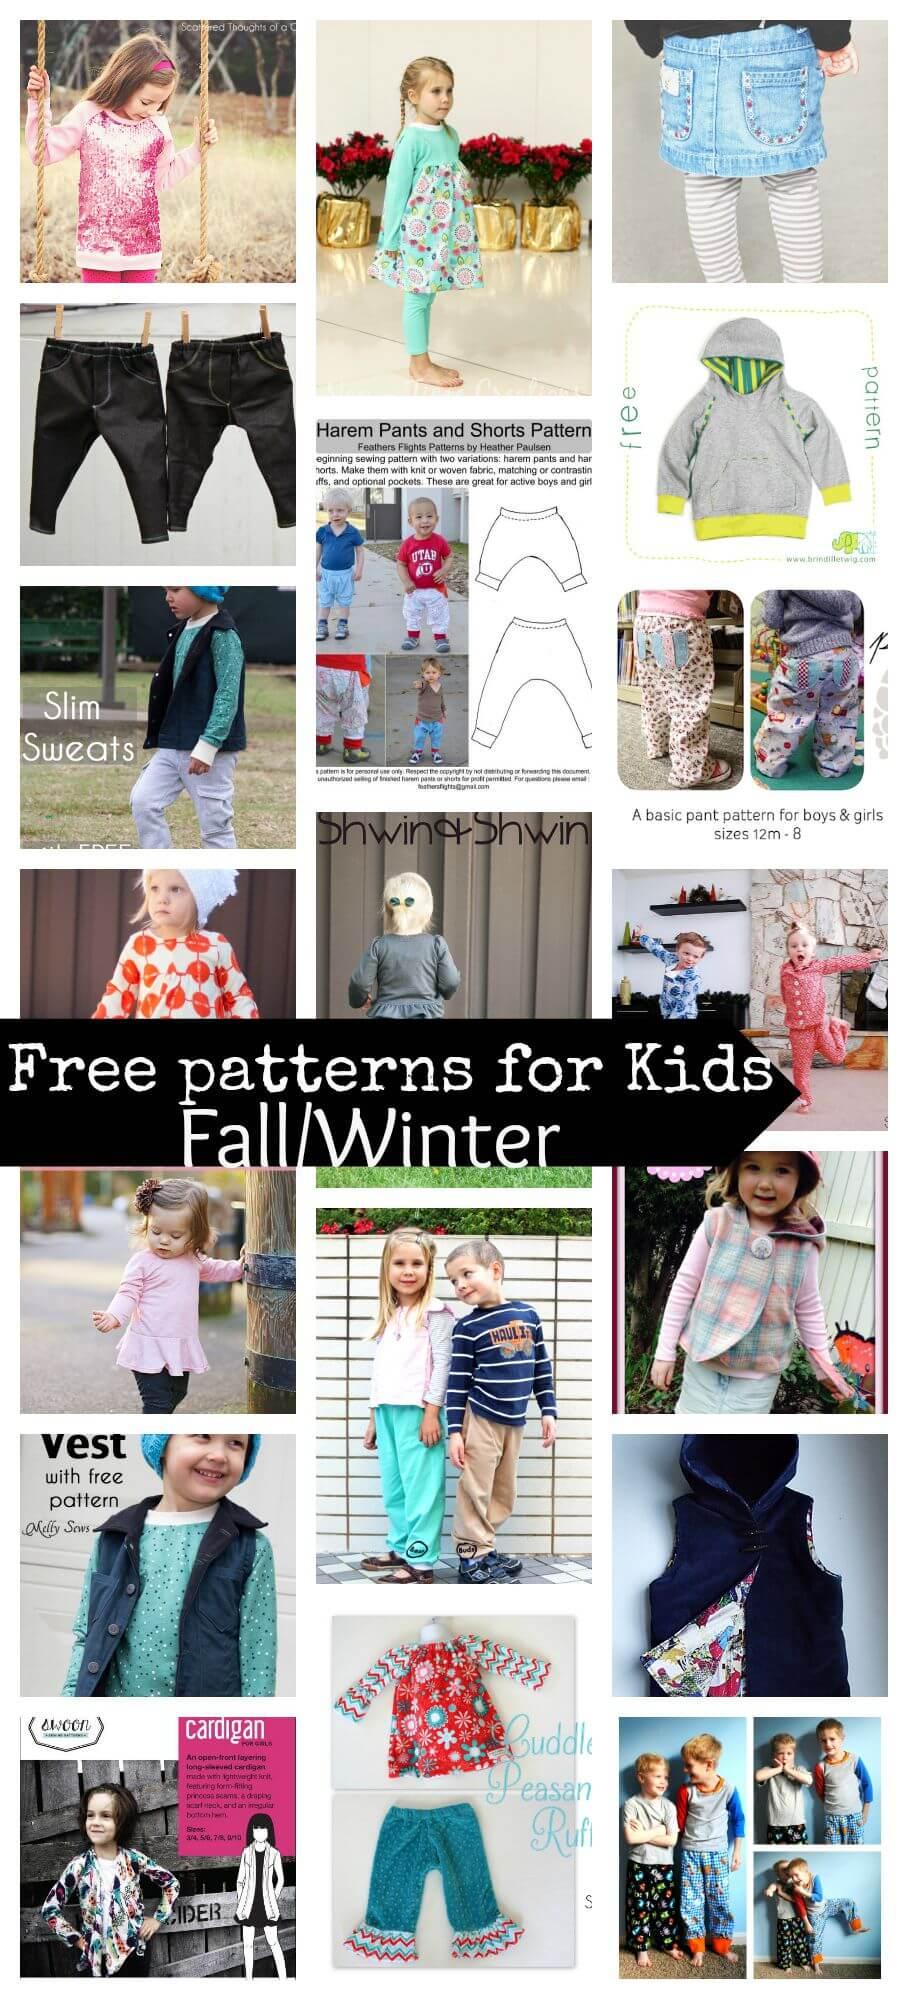 Free patterns for kids